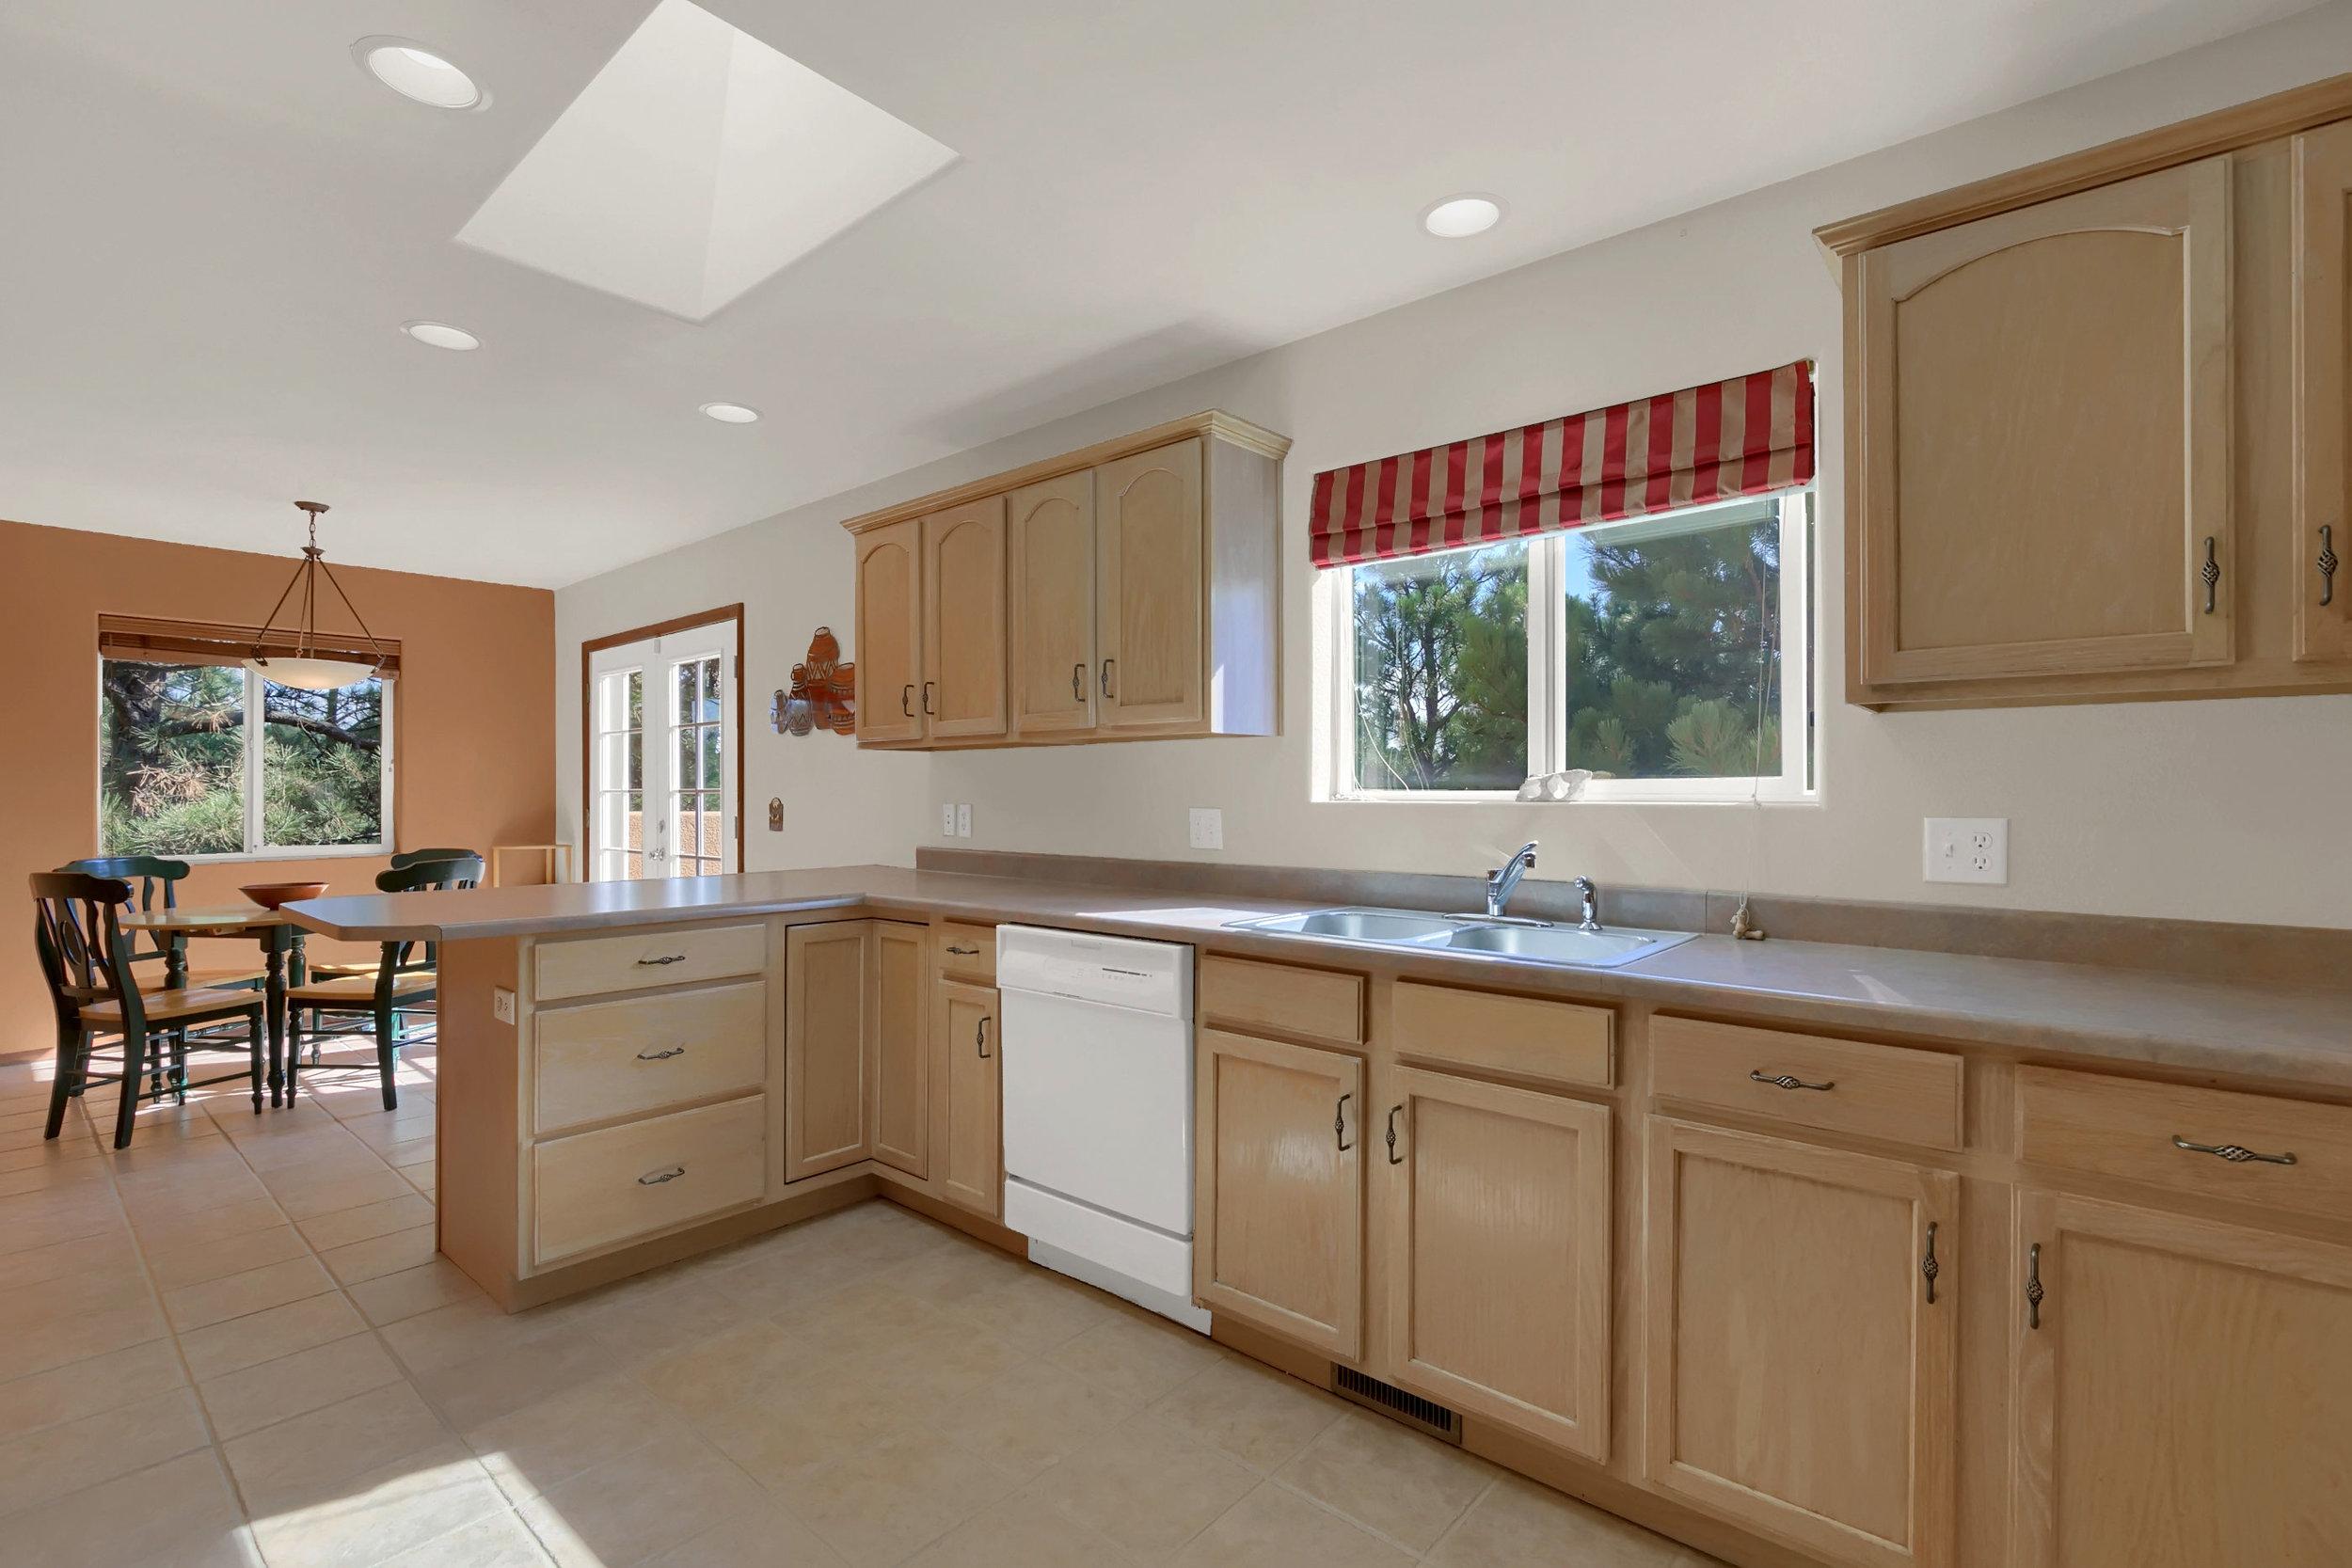 1605 Vickers Drive Colorado-print-013-012-Kitchen-2800x1867-300dpi.jpg